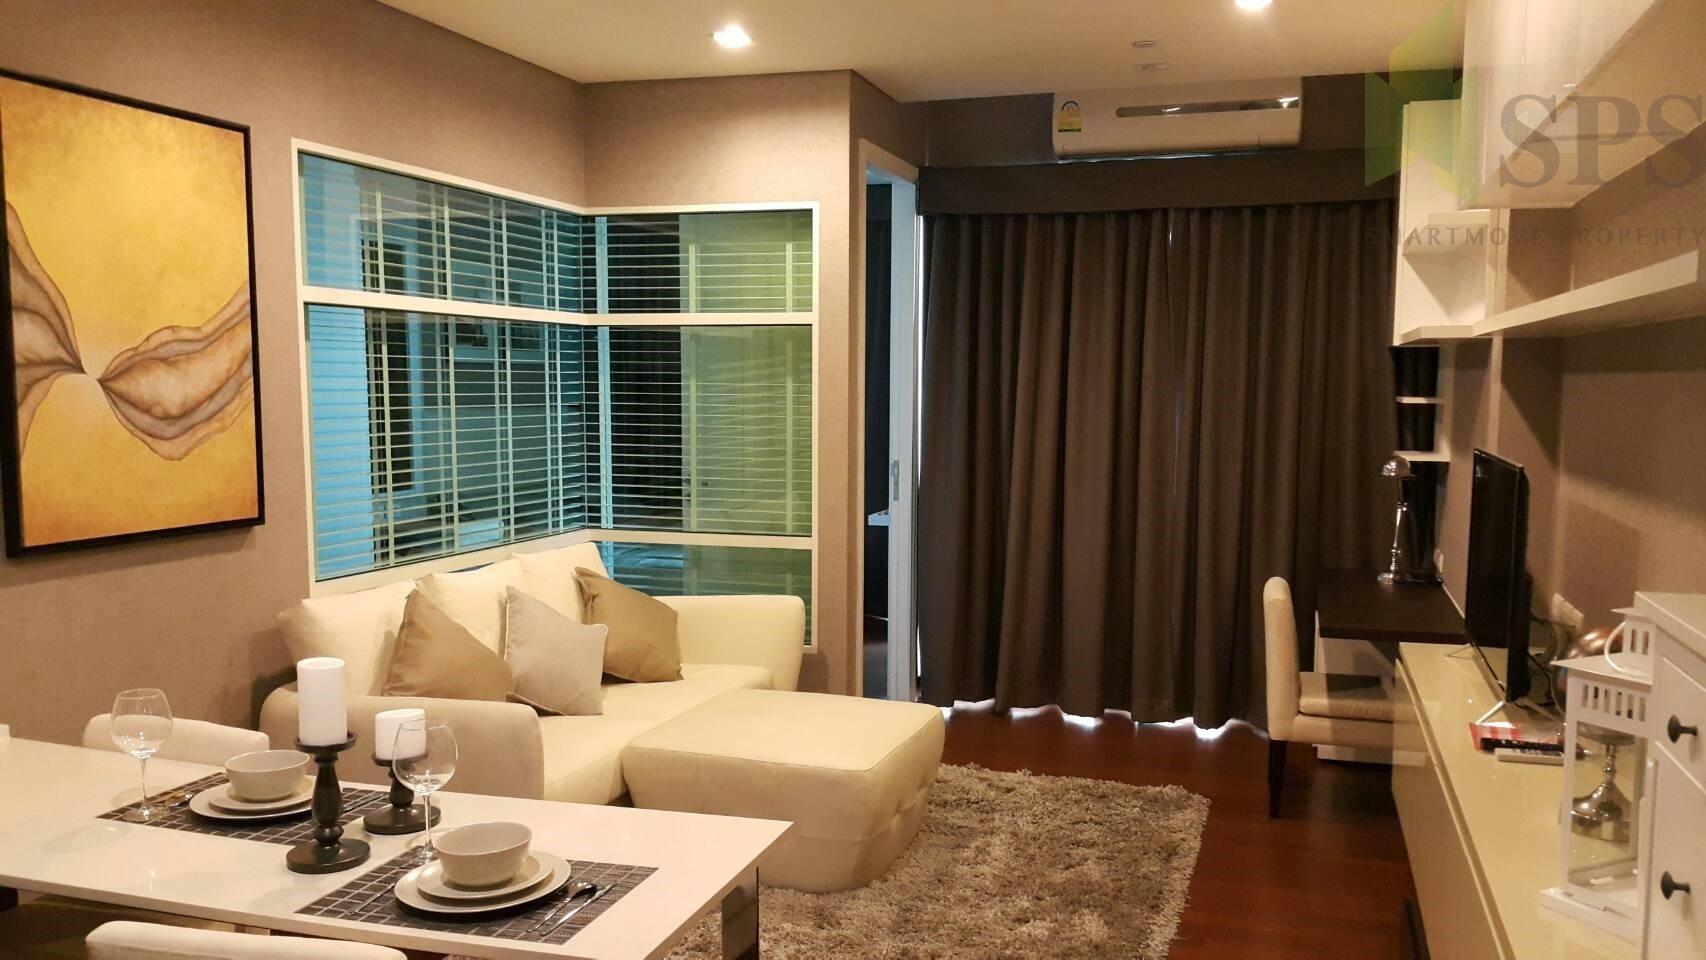 For Rent Condo  Ivy Thonglor 1 bedroom Sukhumvit 55(SPS-GC115)